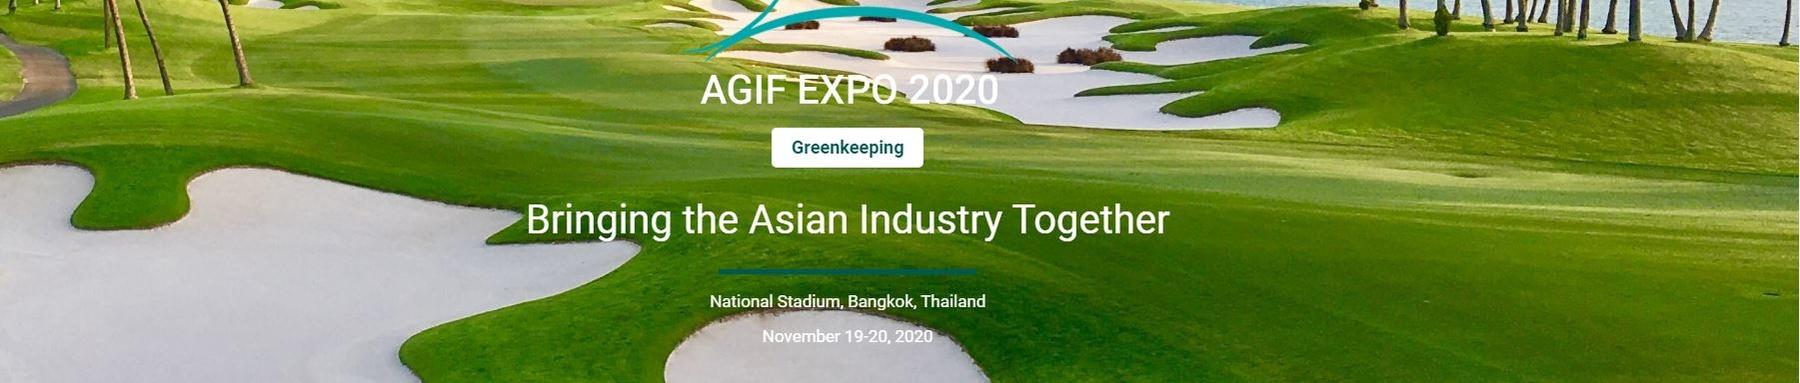 AGIF Expo header banner